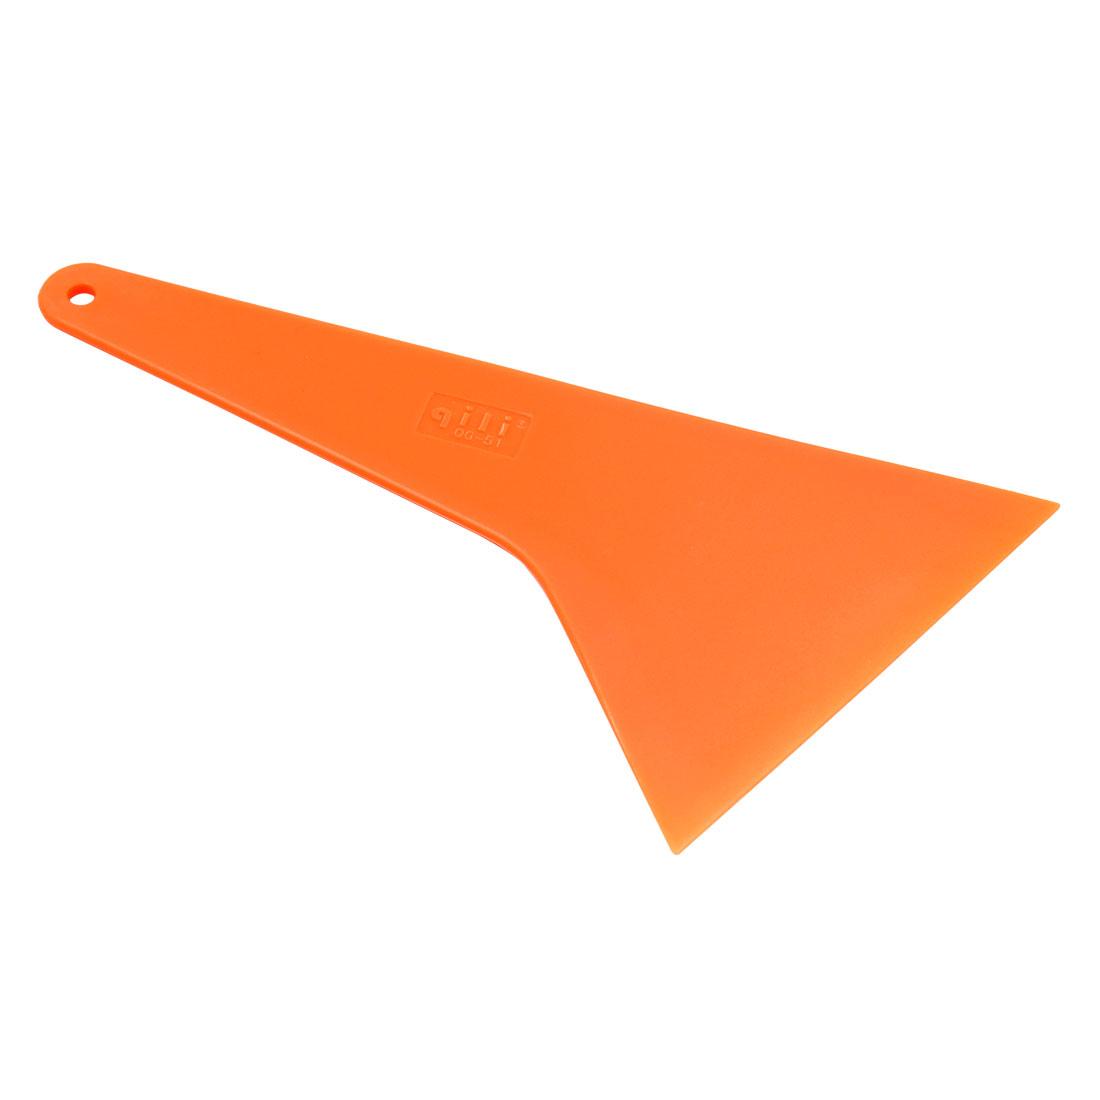 Orange Windshield Window Ice Scraper Snow Shovel Wiper for Car Vehicle